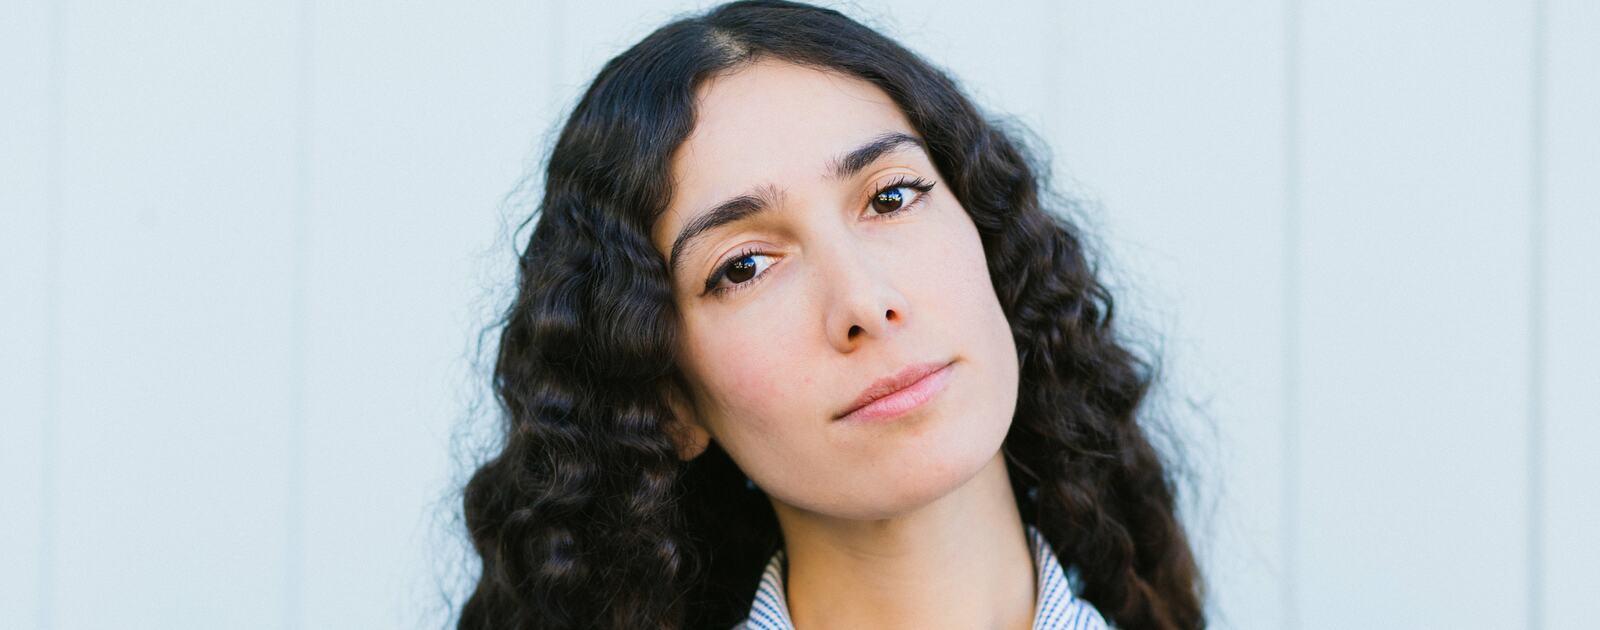 Bedouine , Armenian singer -songwriter Azniv Korkejian